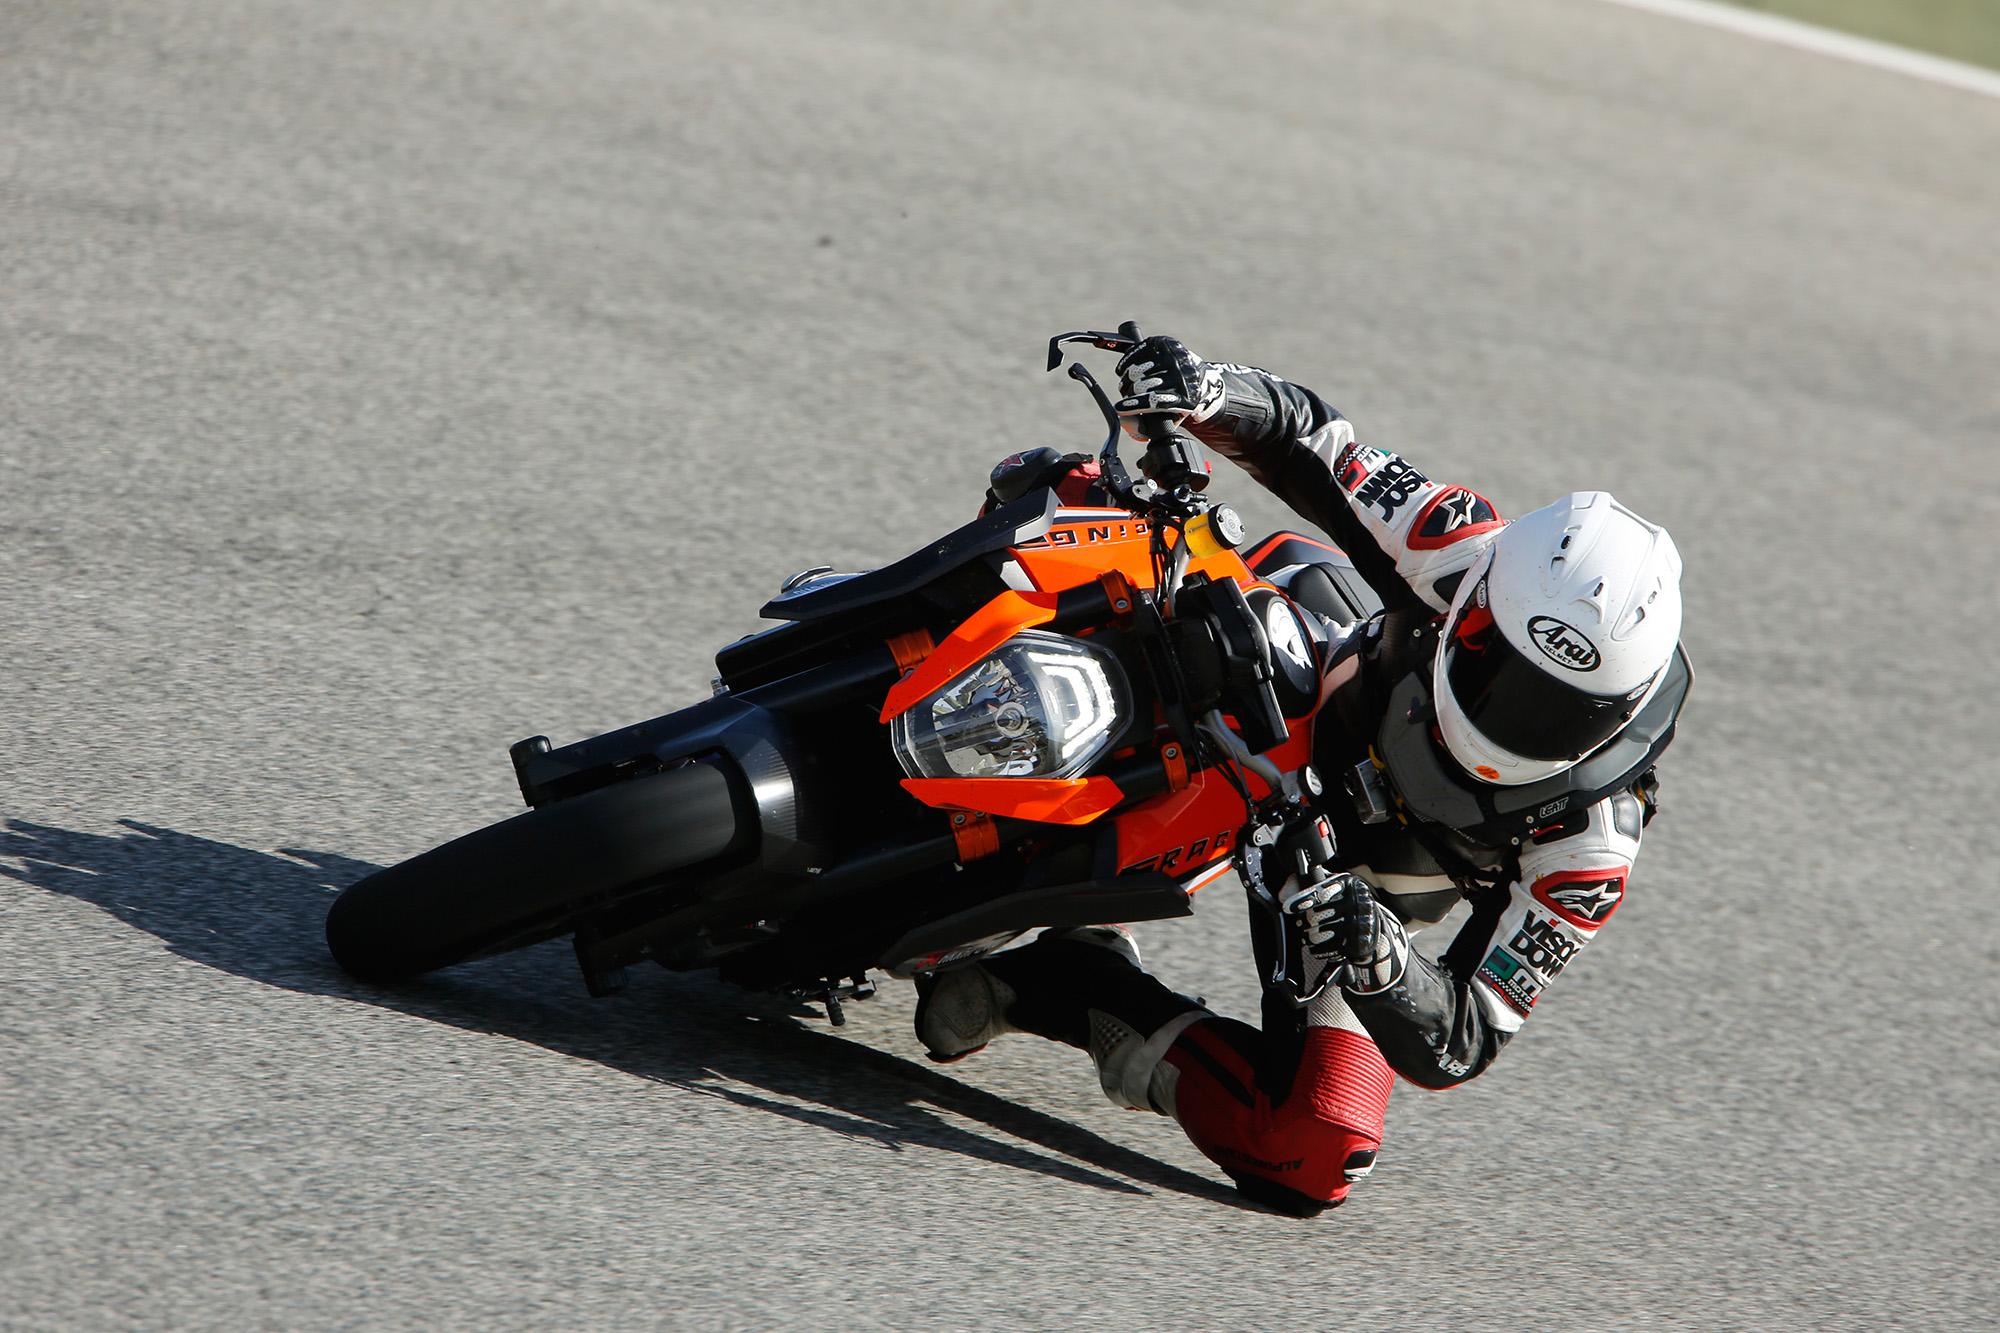 Track review: KTM 1290 Super Duke R